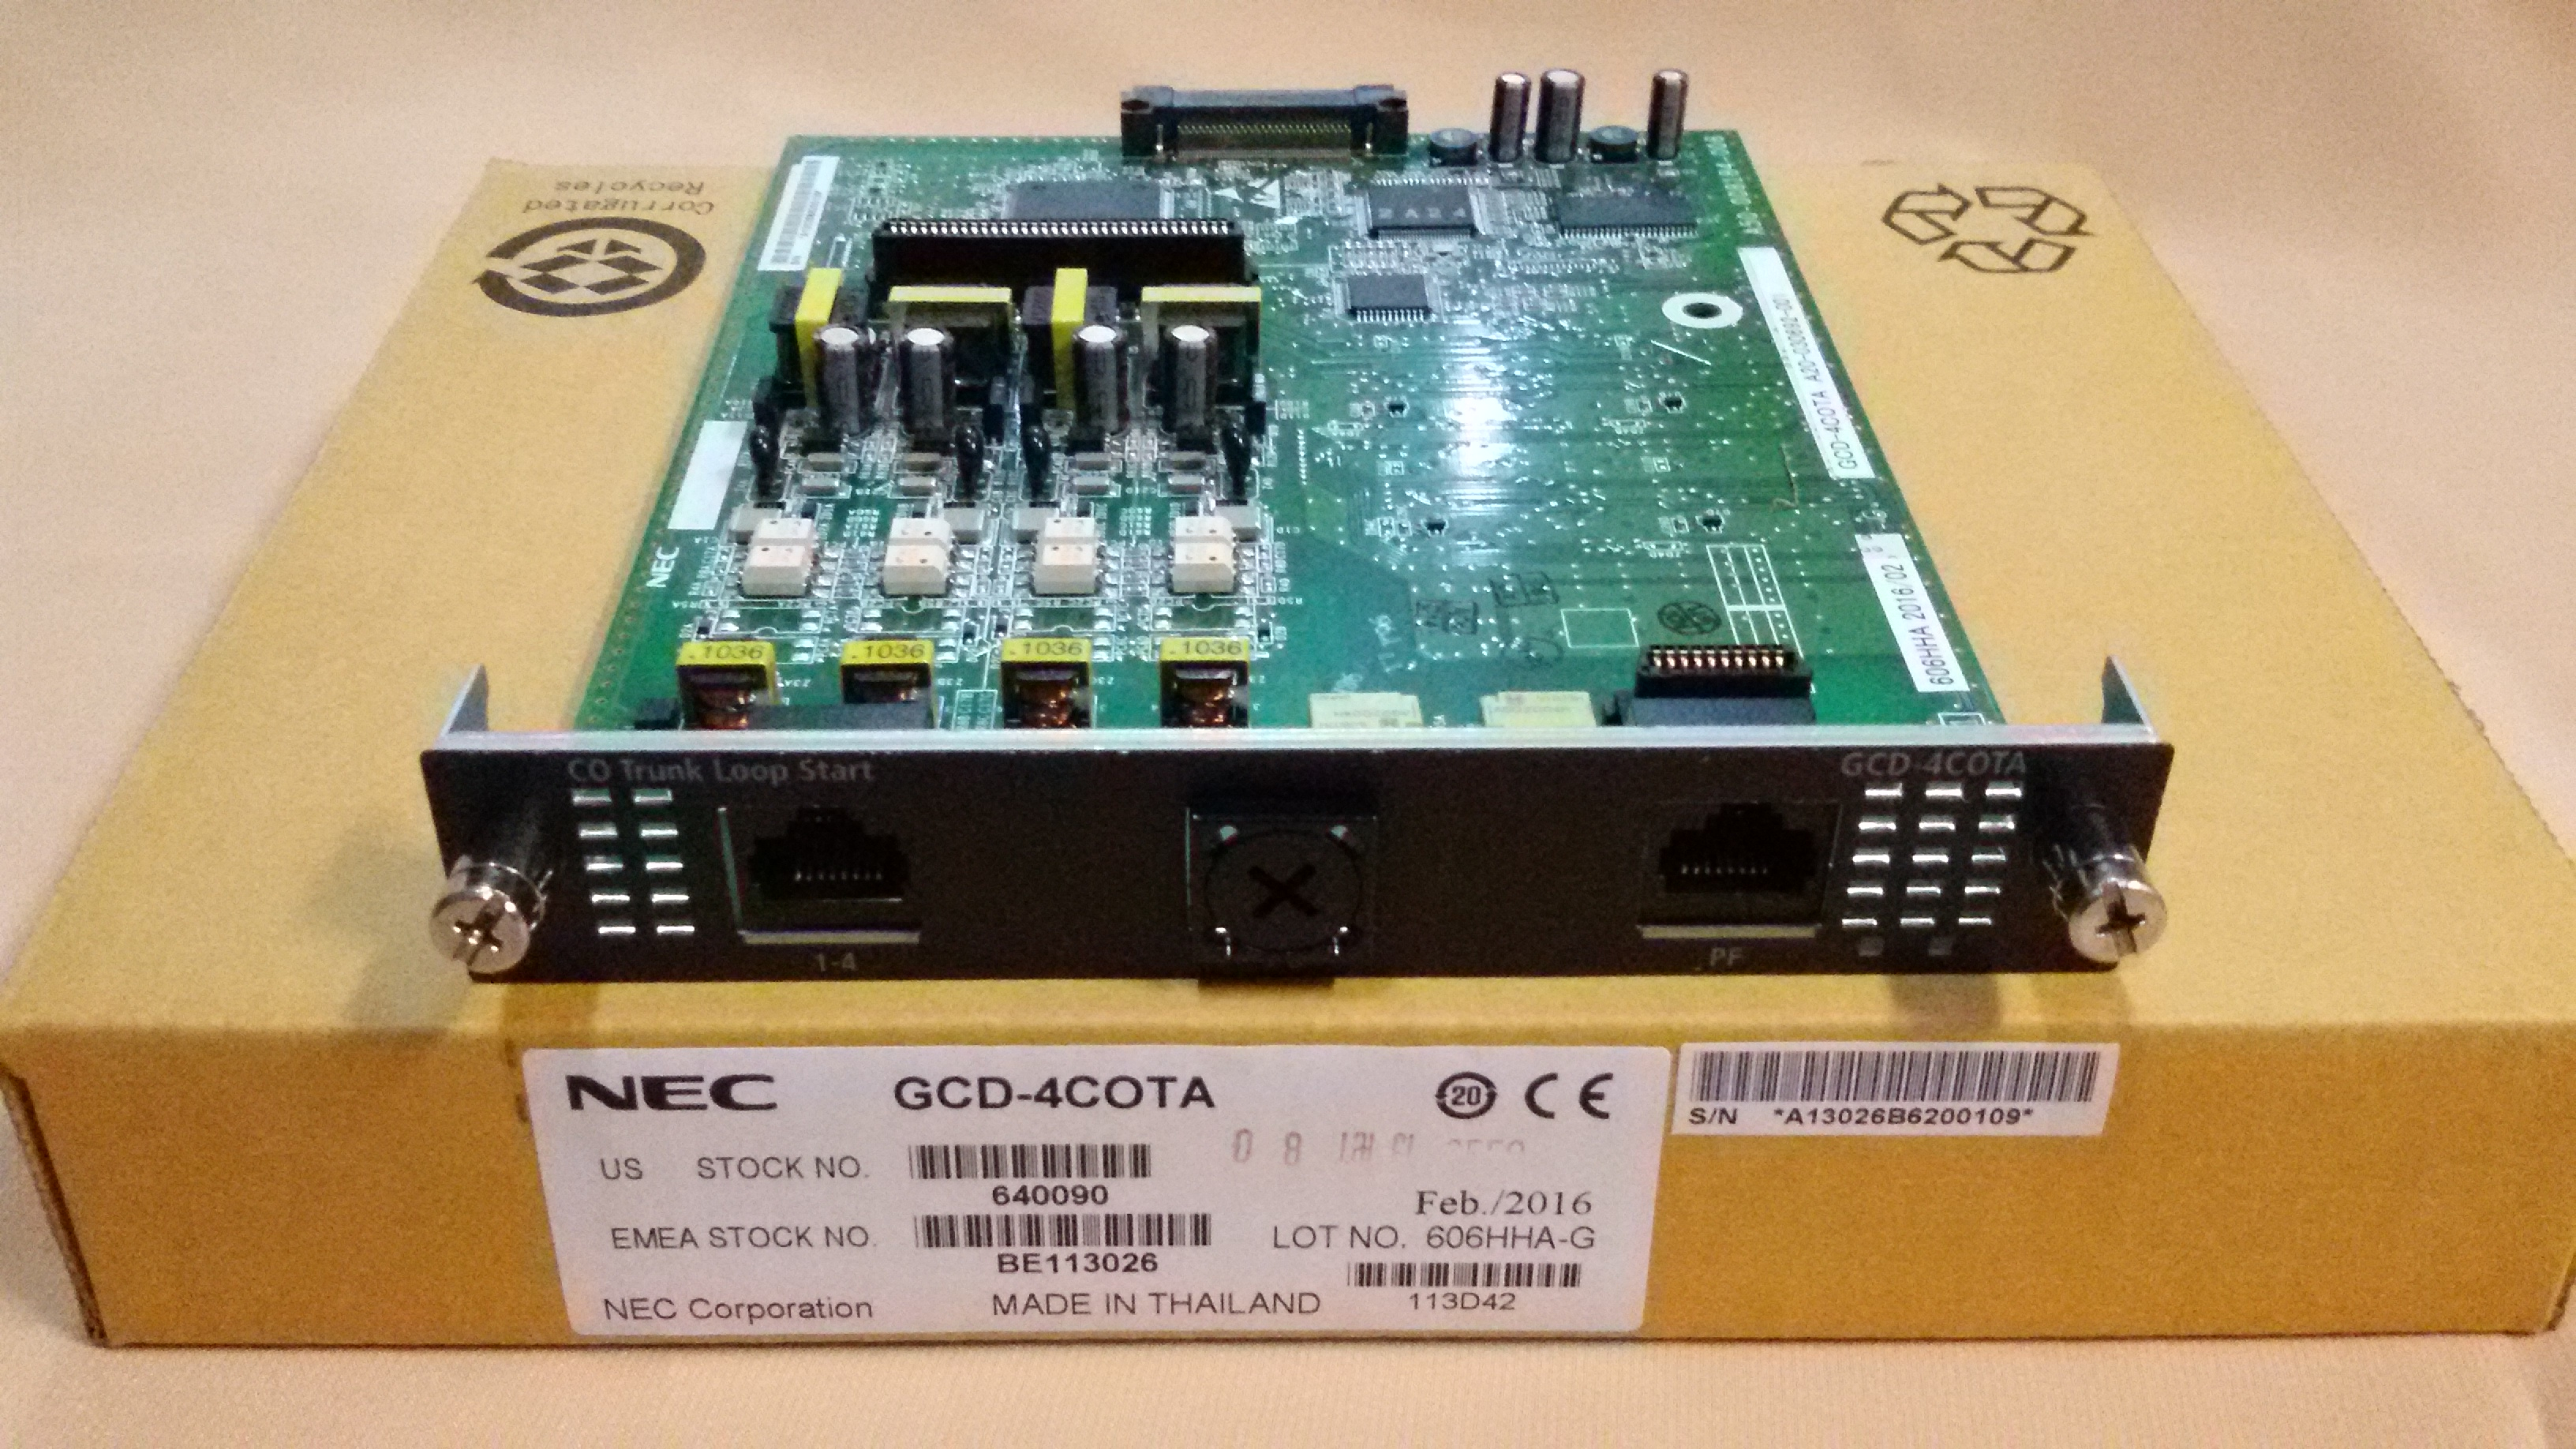 GCD-4COTA